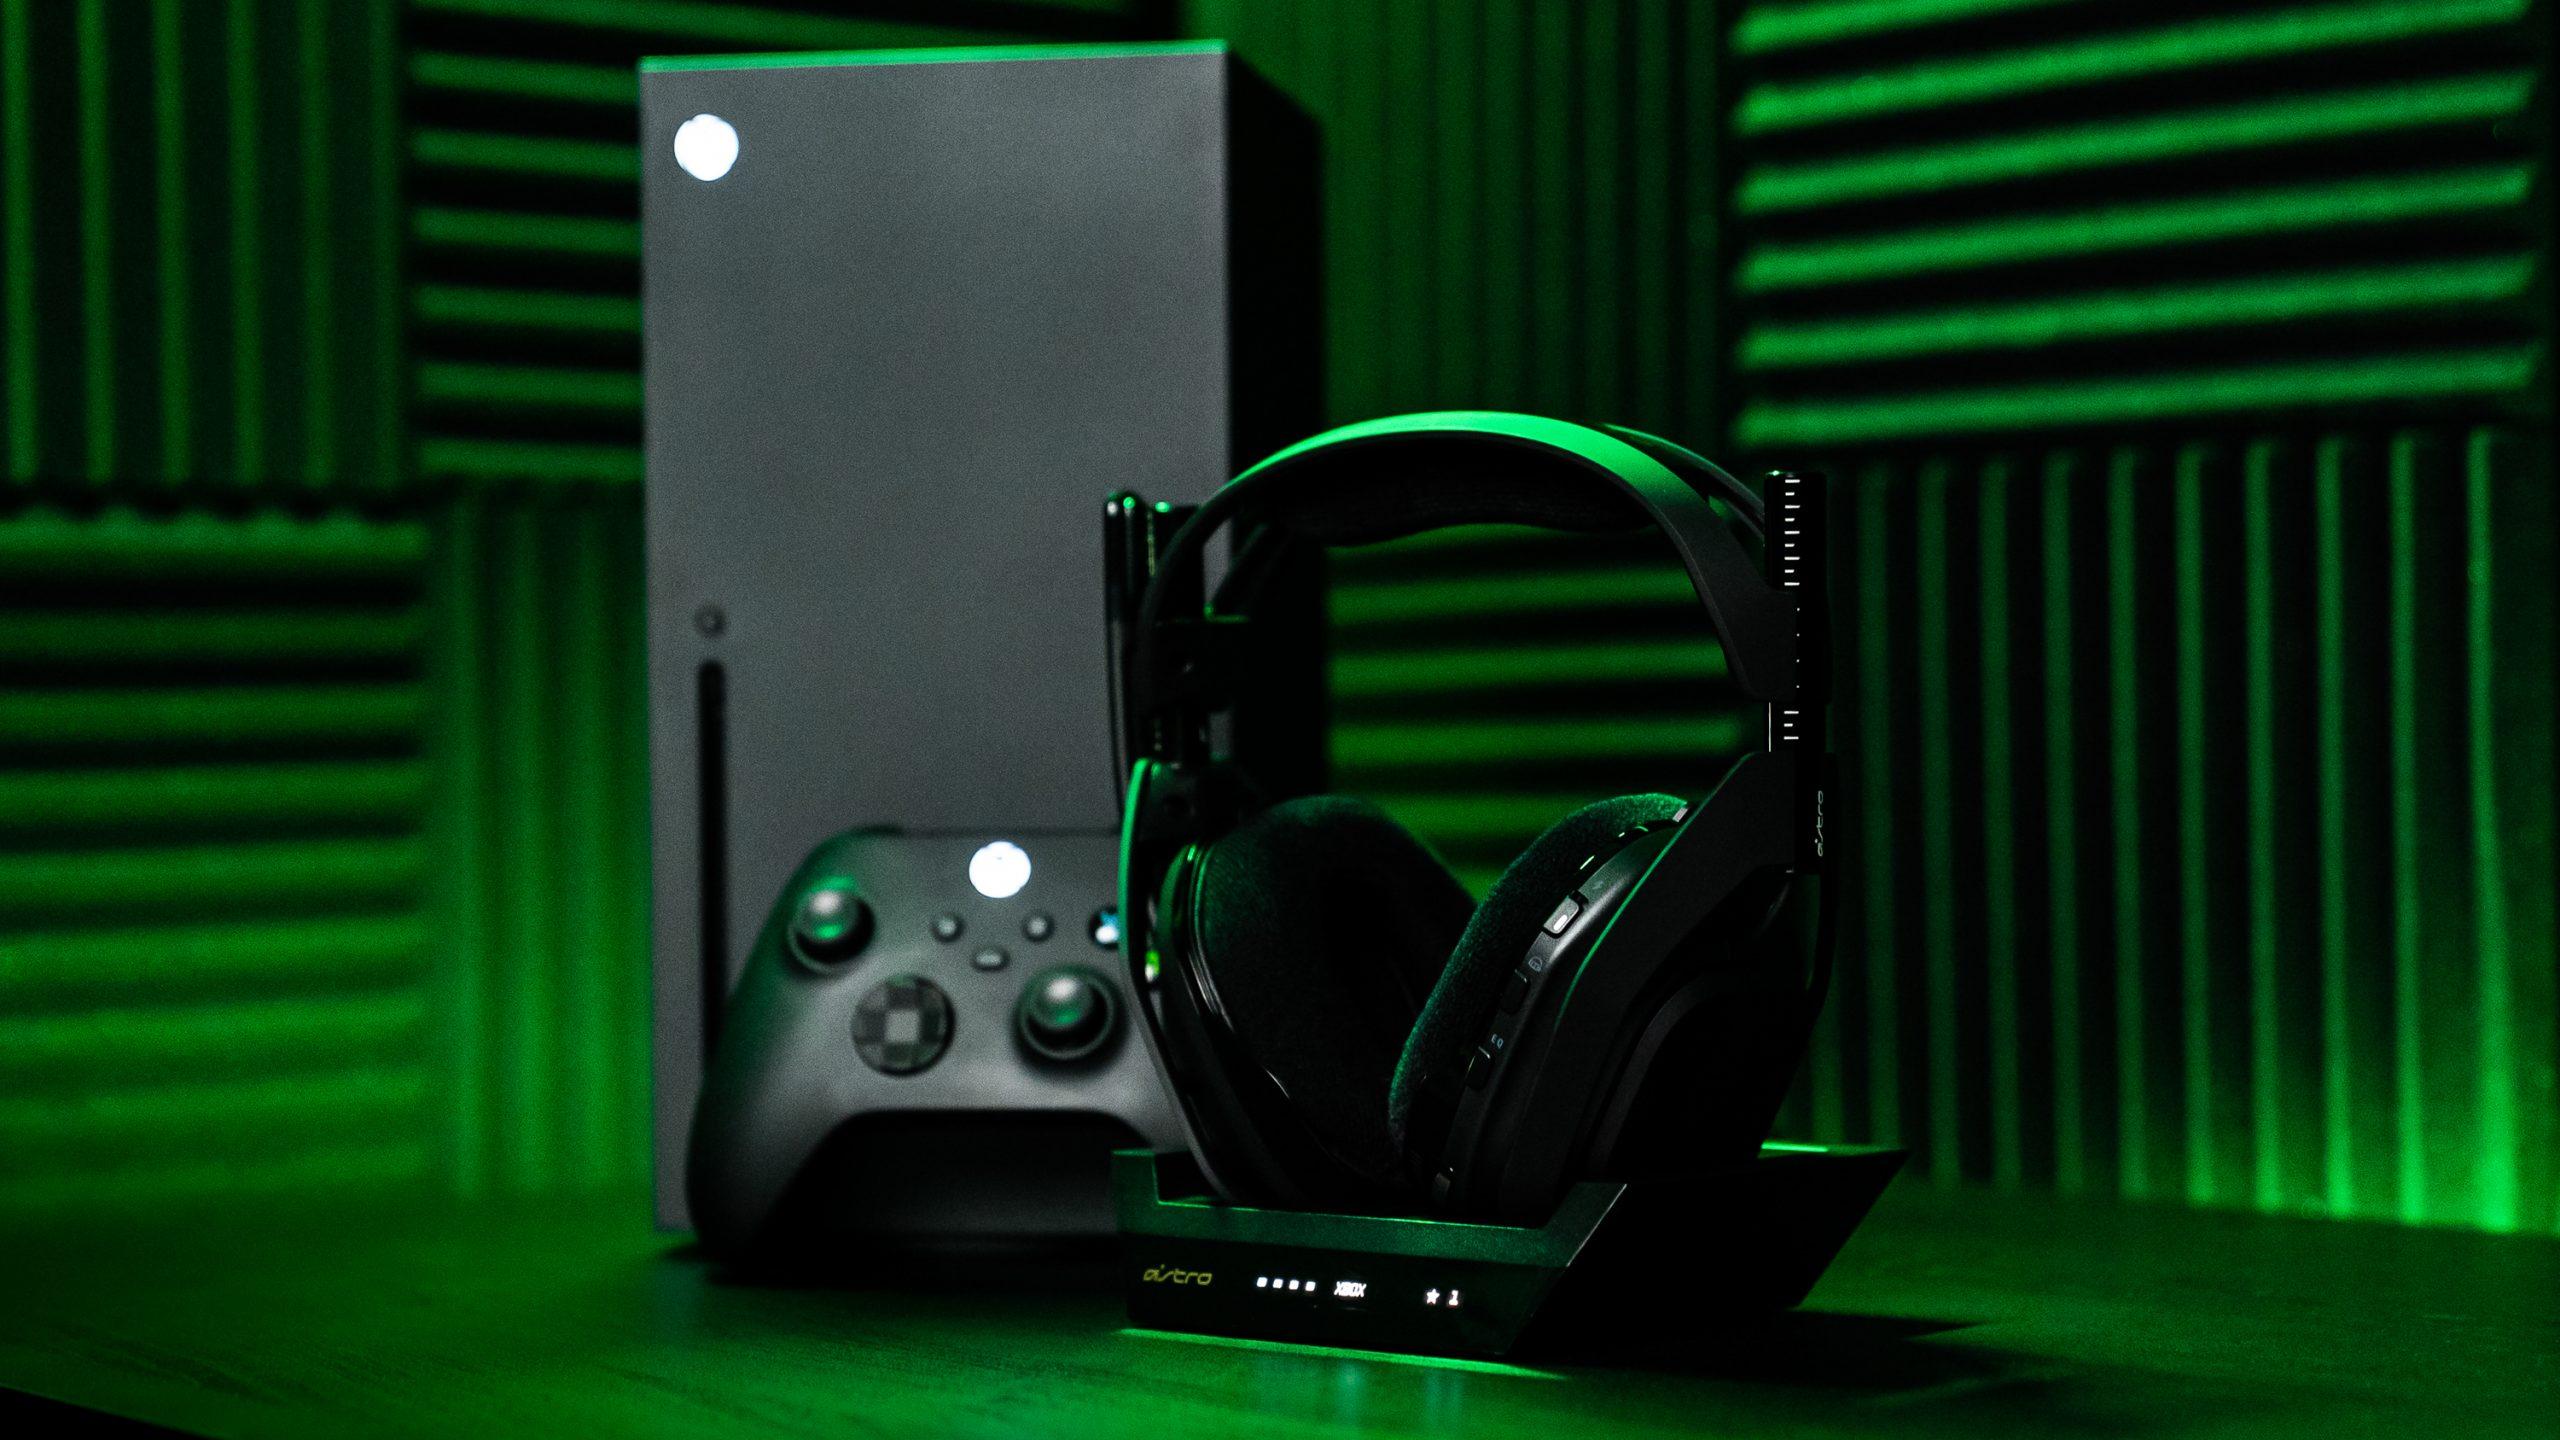 A50 Headset + Xbox Series X|S Setup Guide